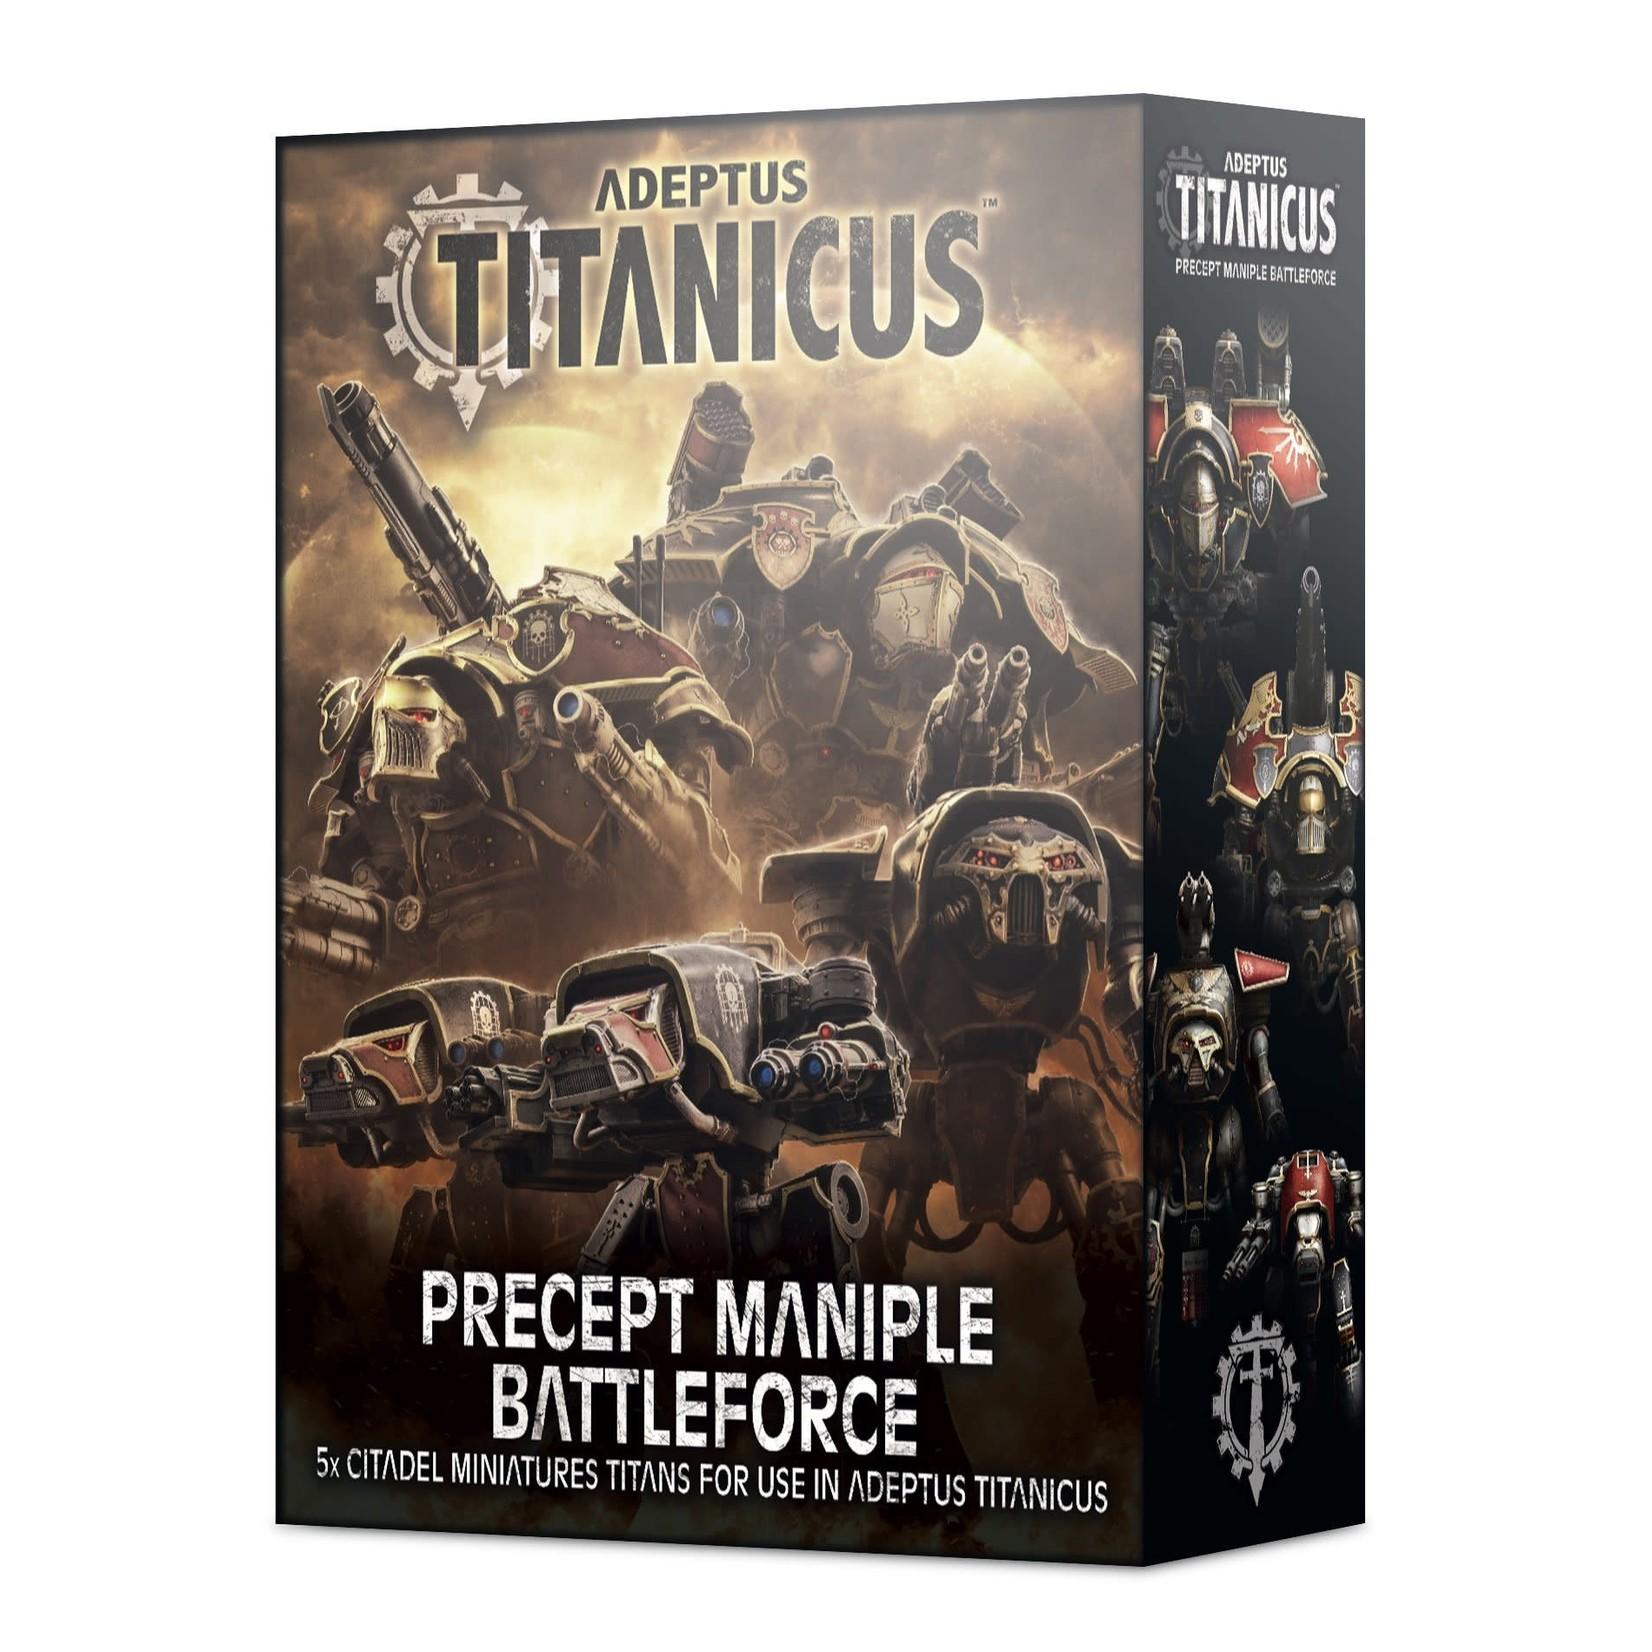 Games Workshop Adeptus Titanicus Precept Maniple Battleforce